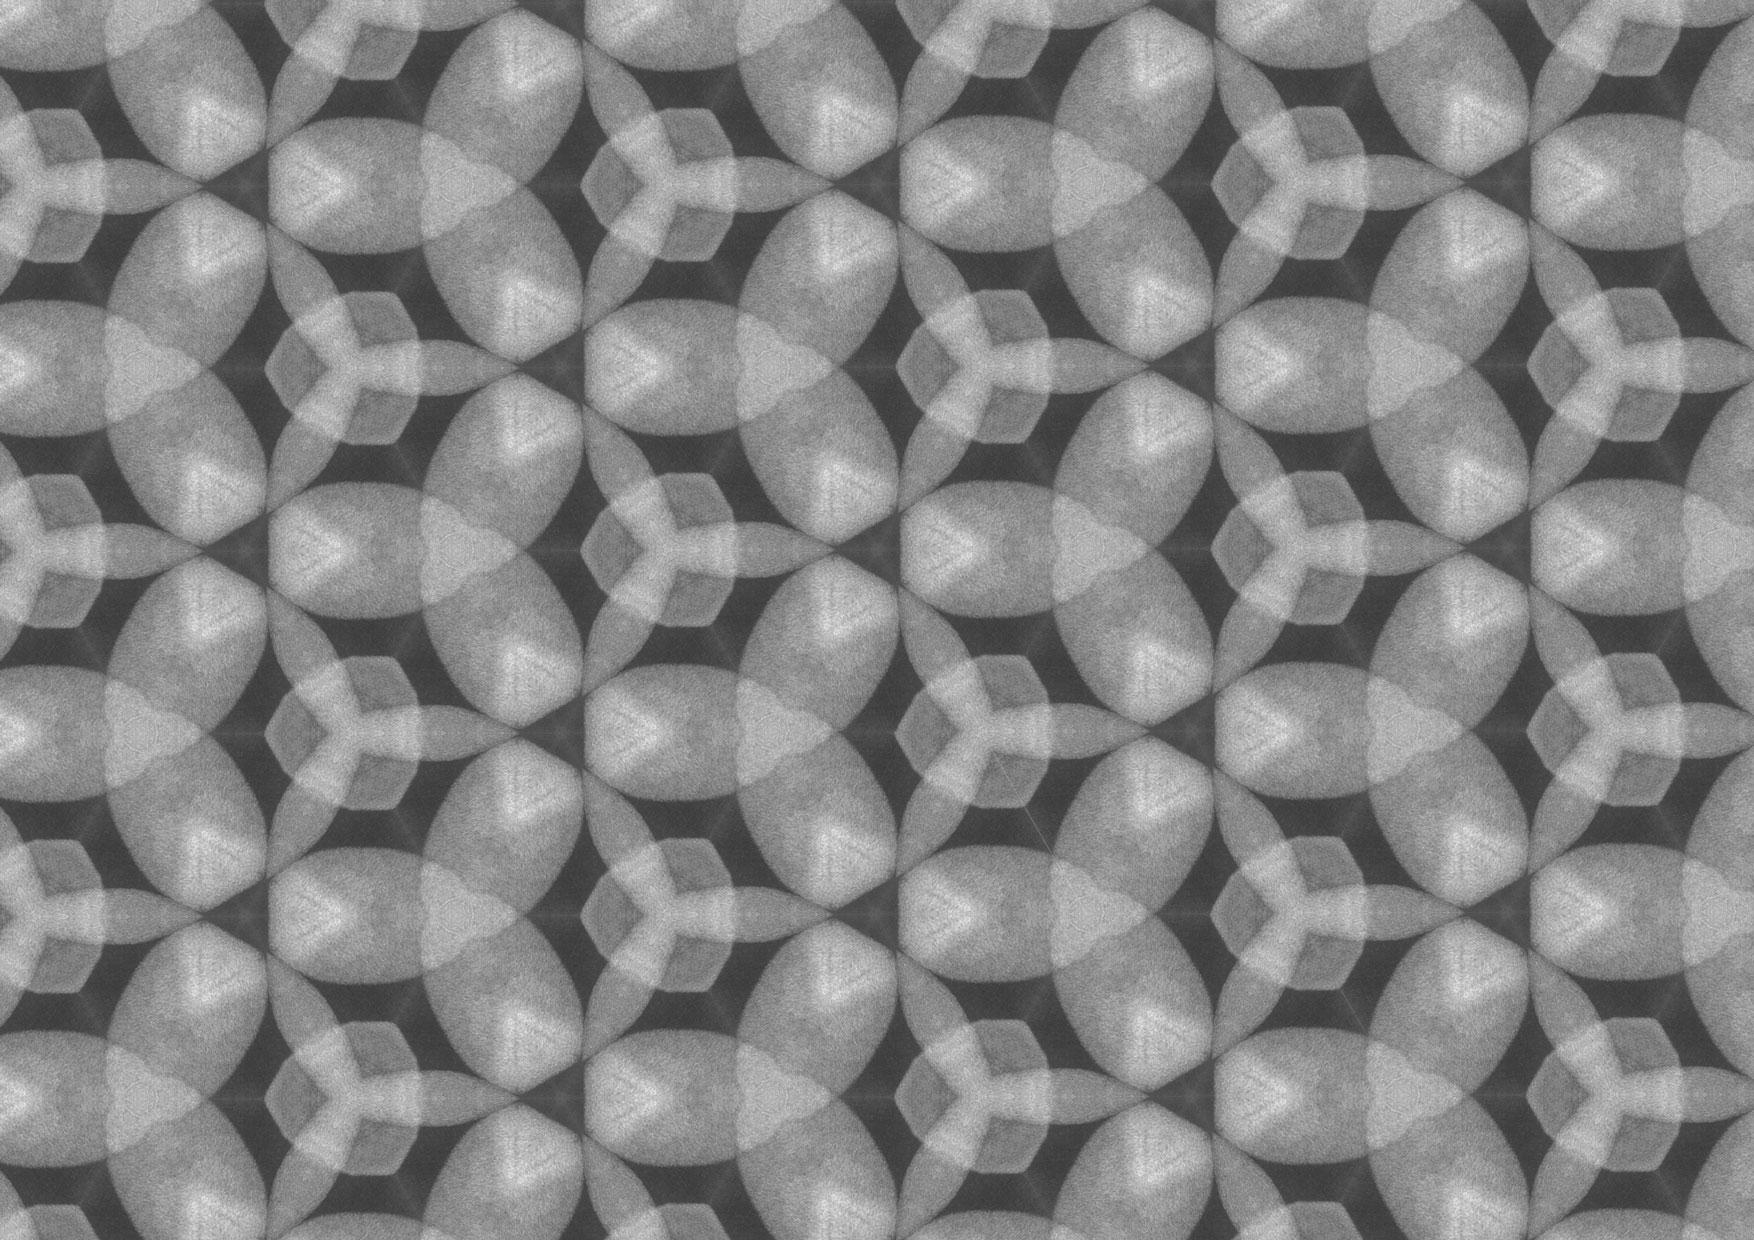 kaleidoskop2.jpg